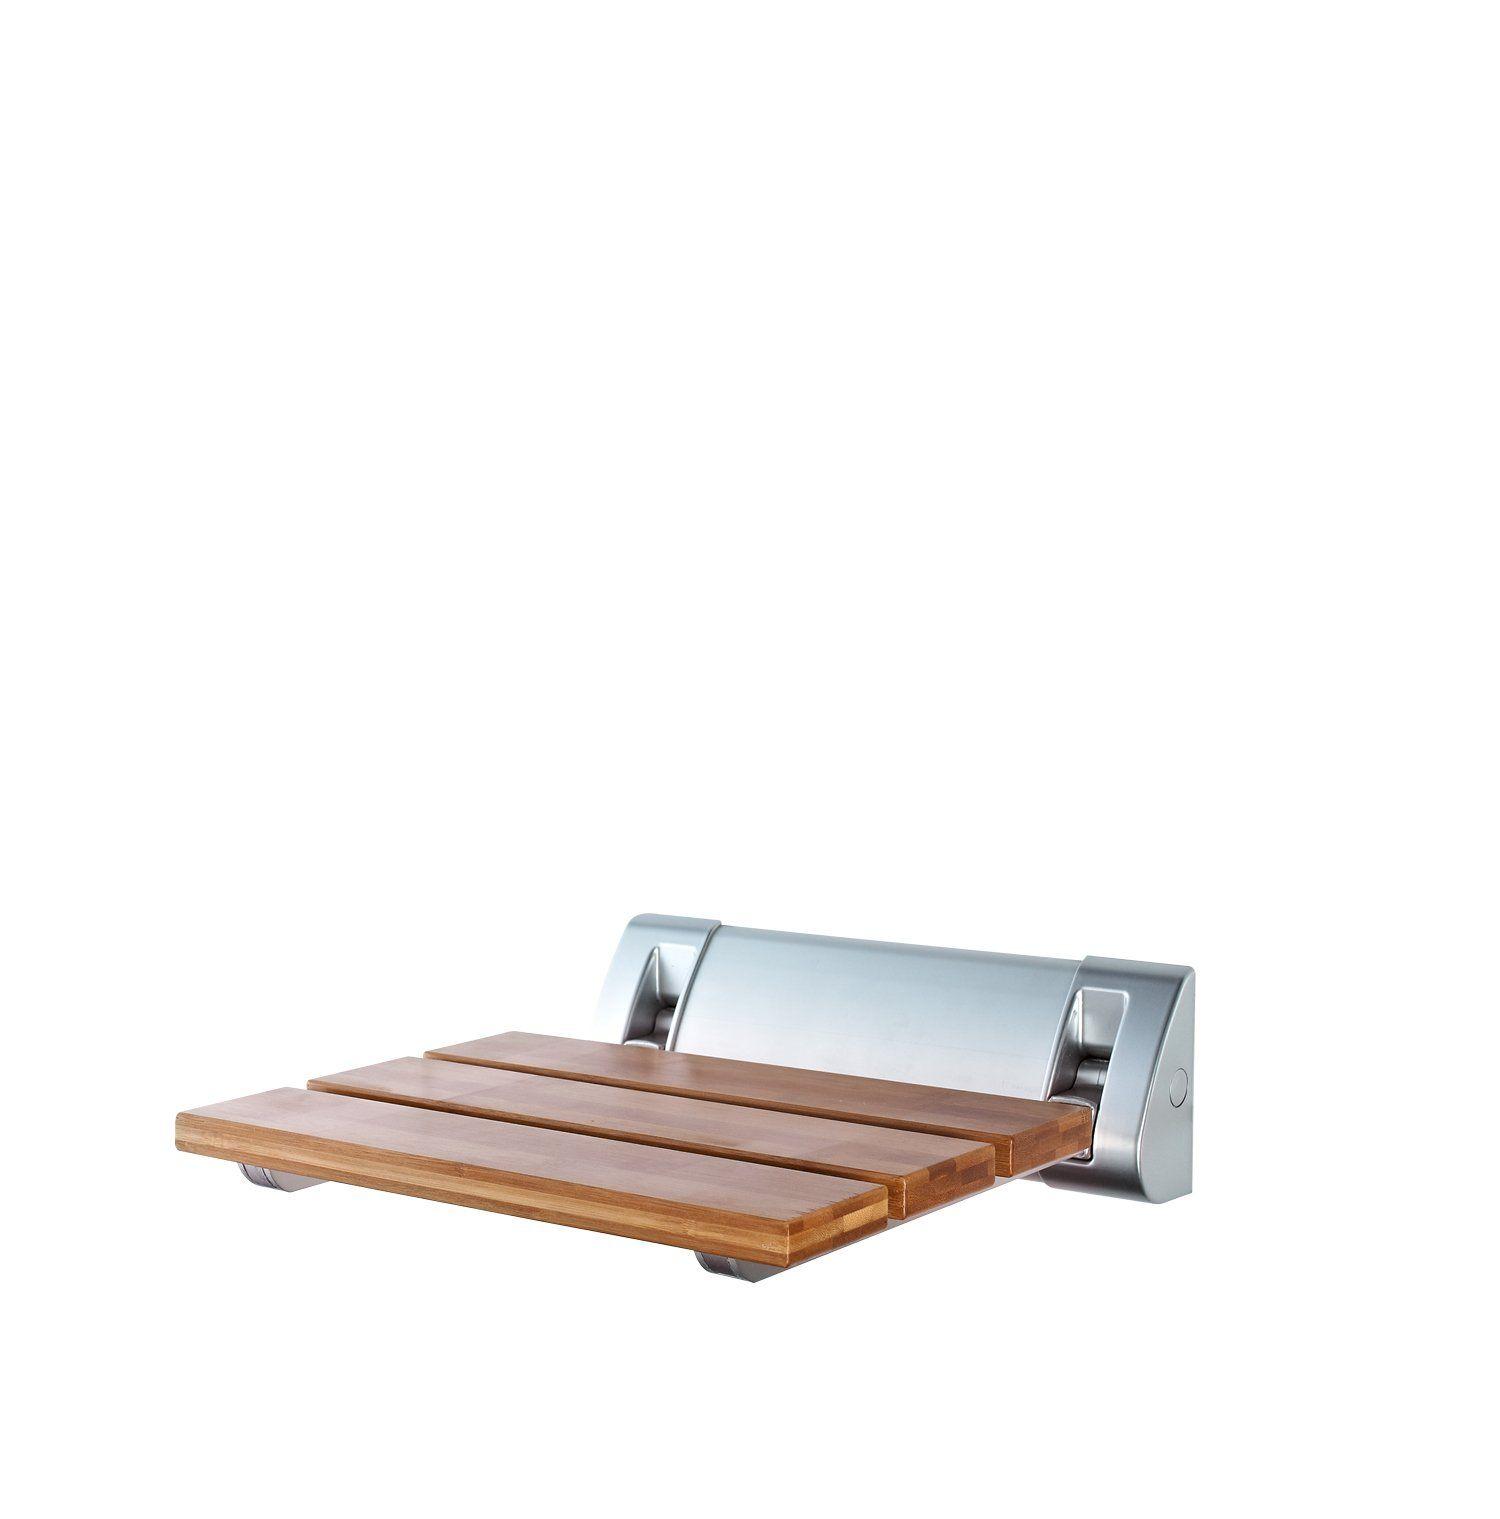 Ridder A0020200 Wall-Mounted Shower Seat Bamboo - 320 x 230 mm ...